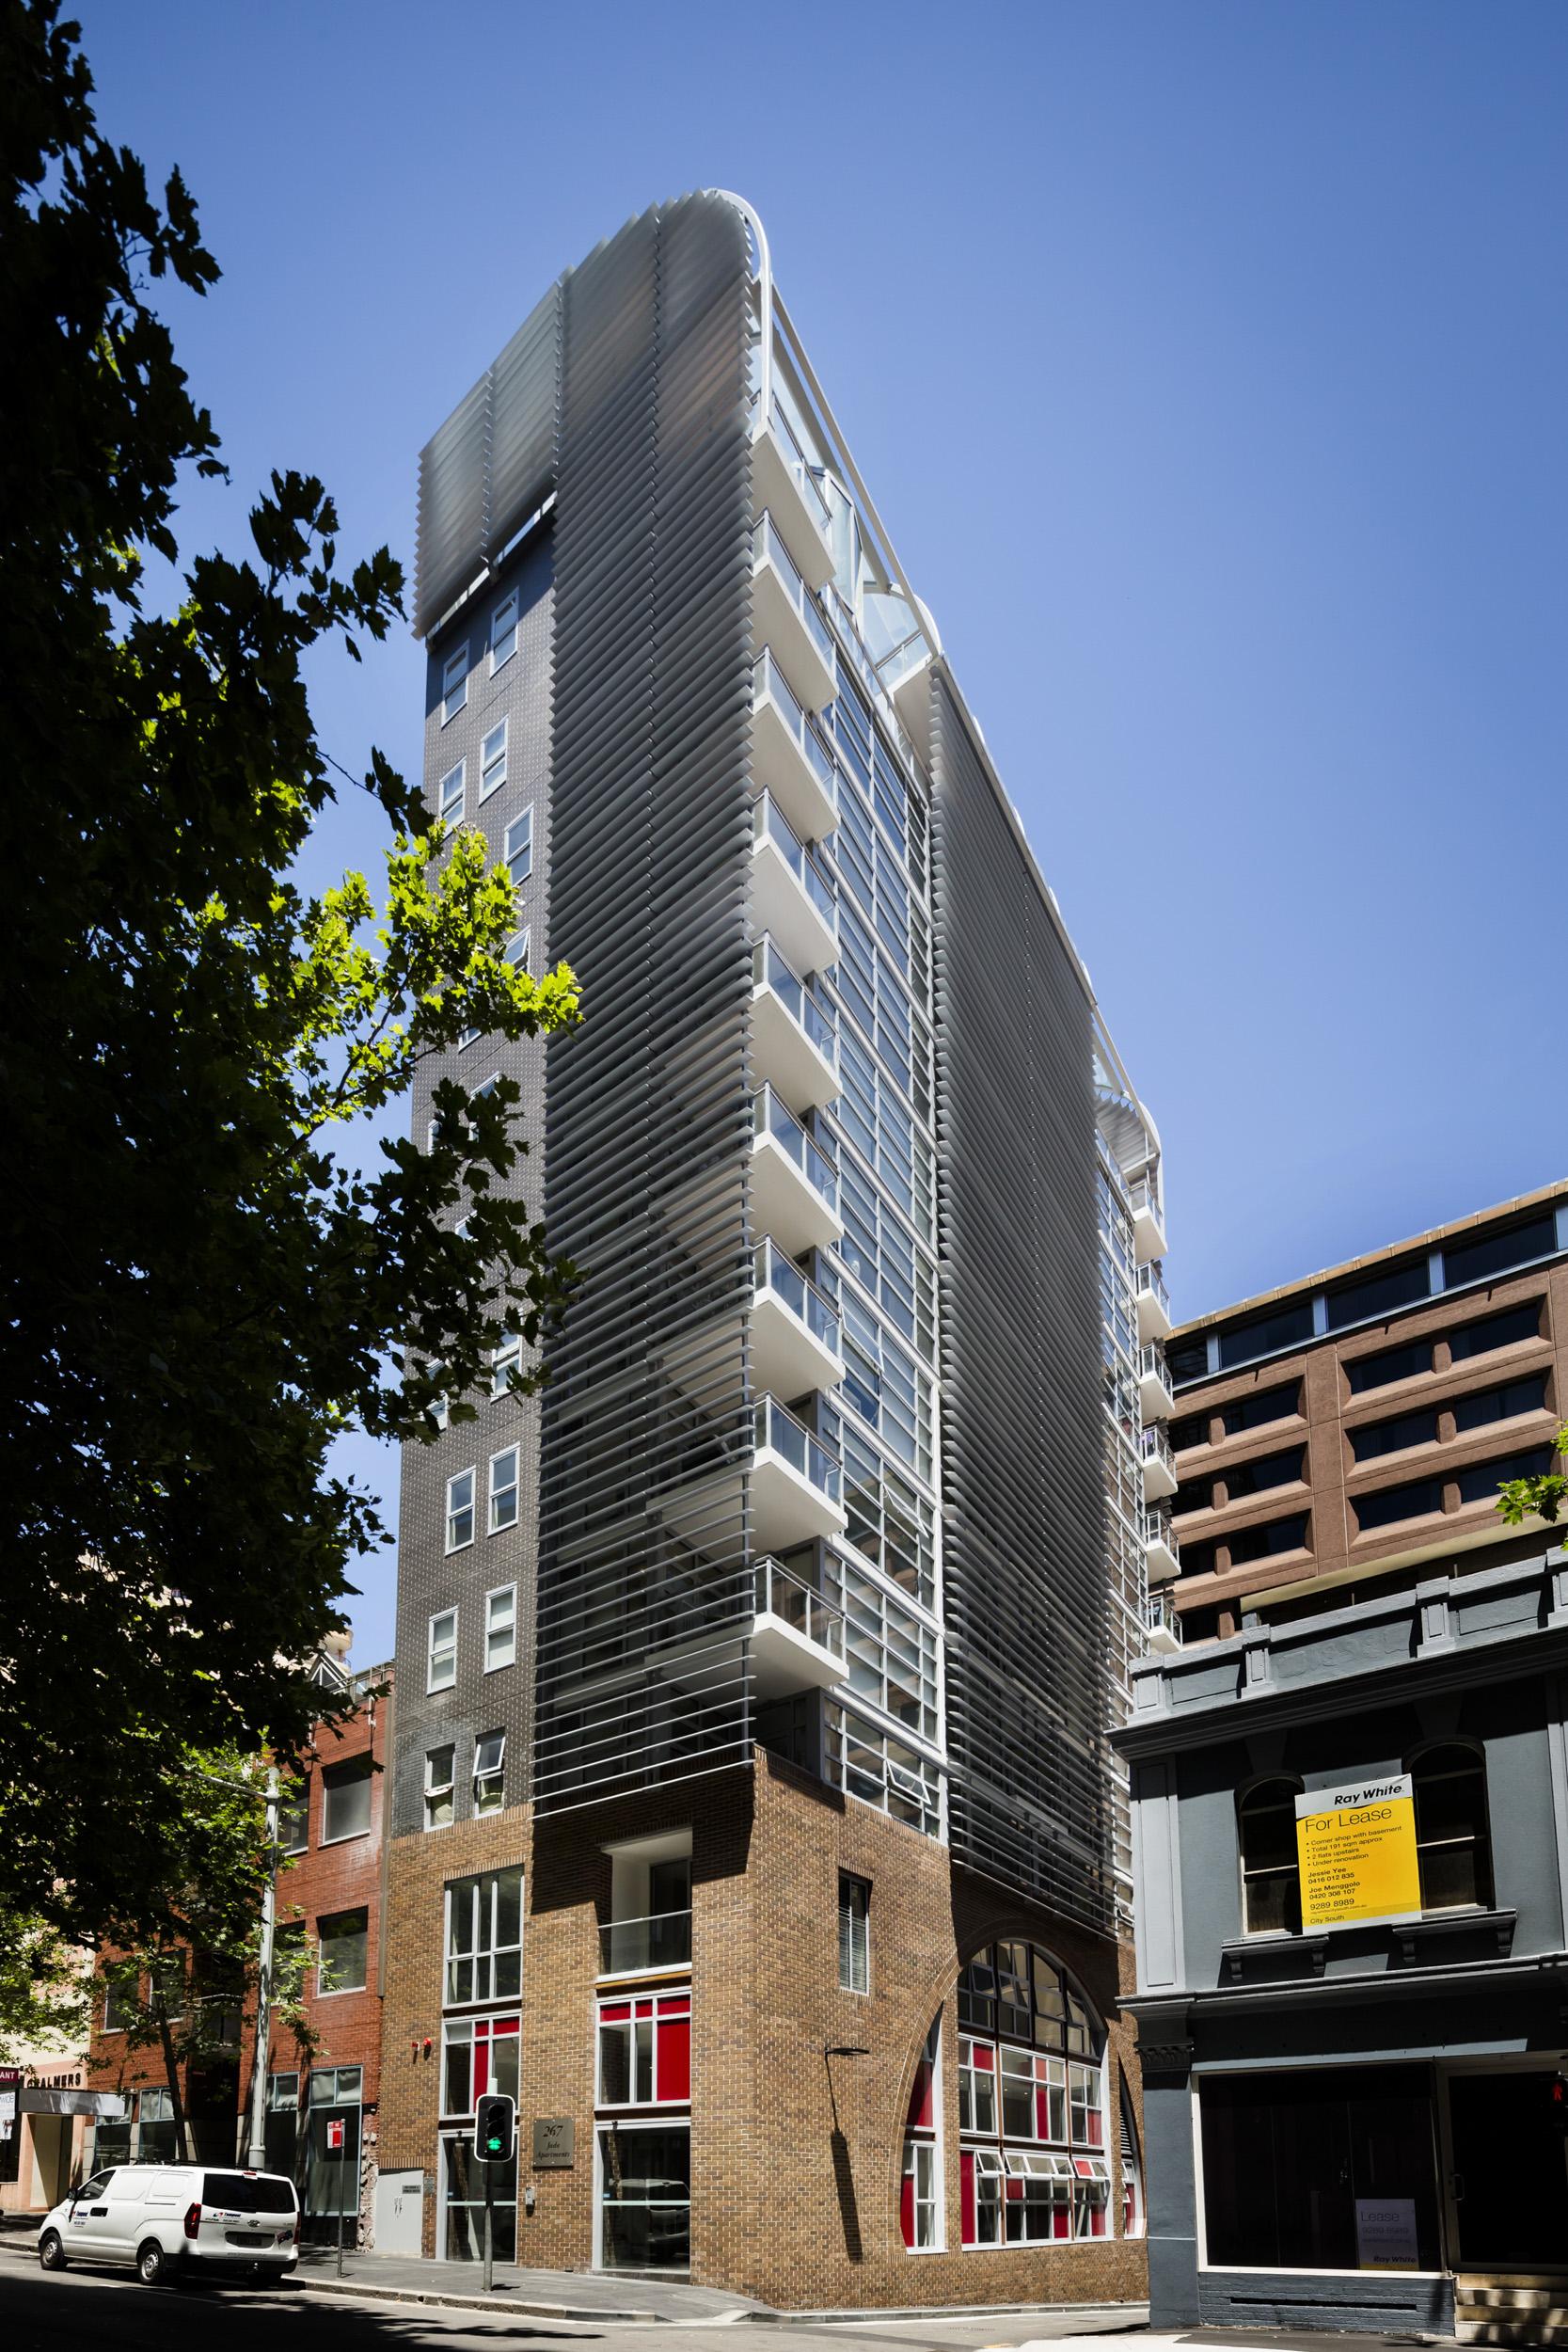 architecture_photography_sydney_australia_16.jpg